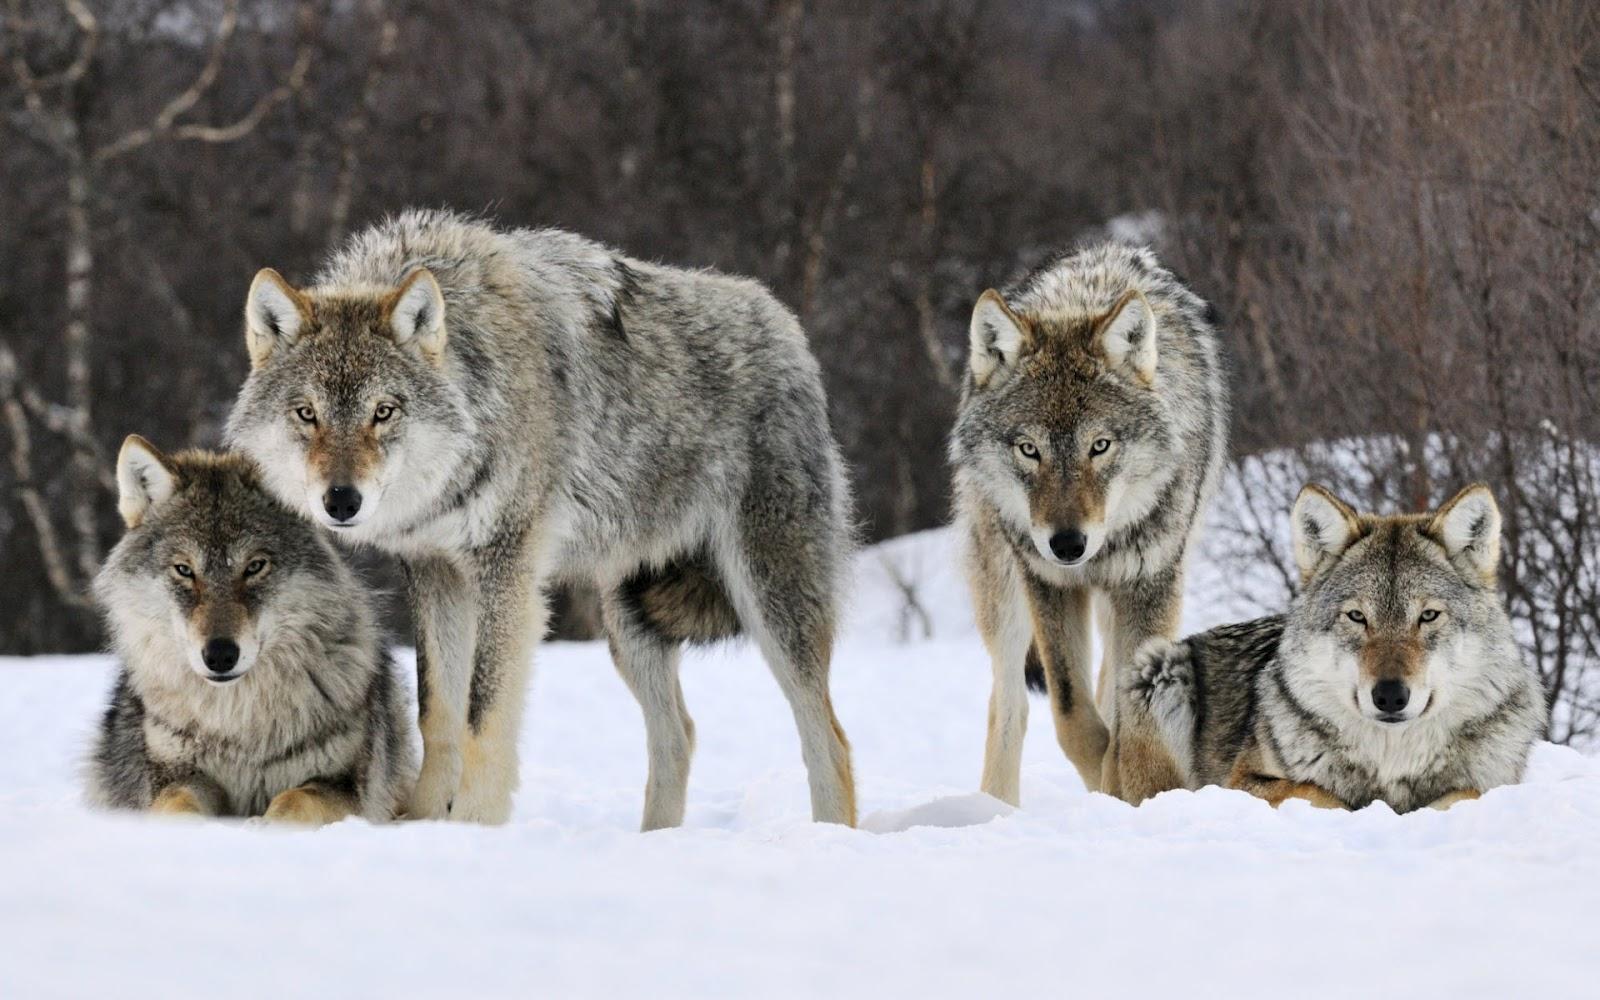 Browniecheesecake: Wolves; Vicious Predators Or Normal